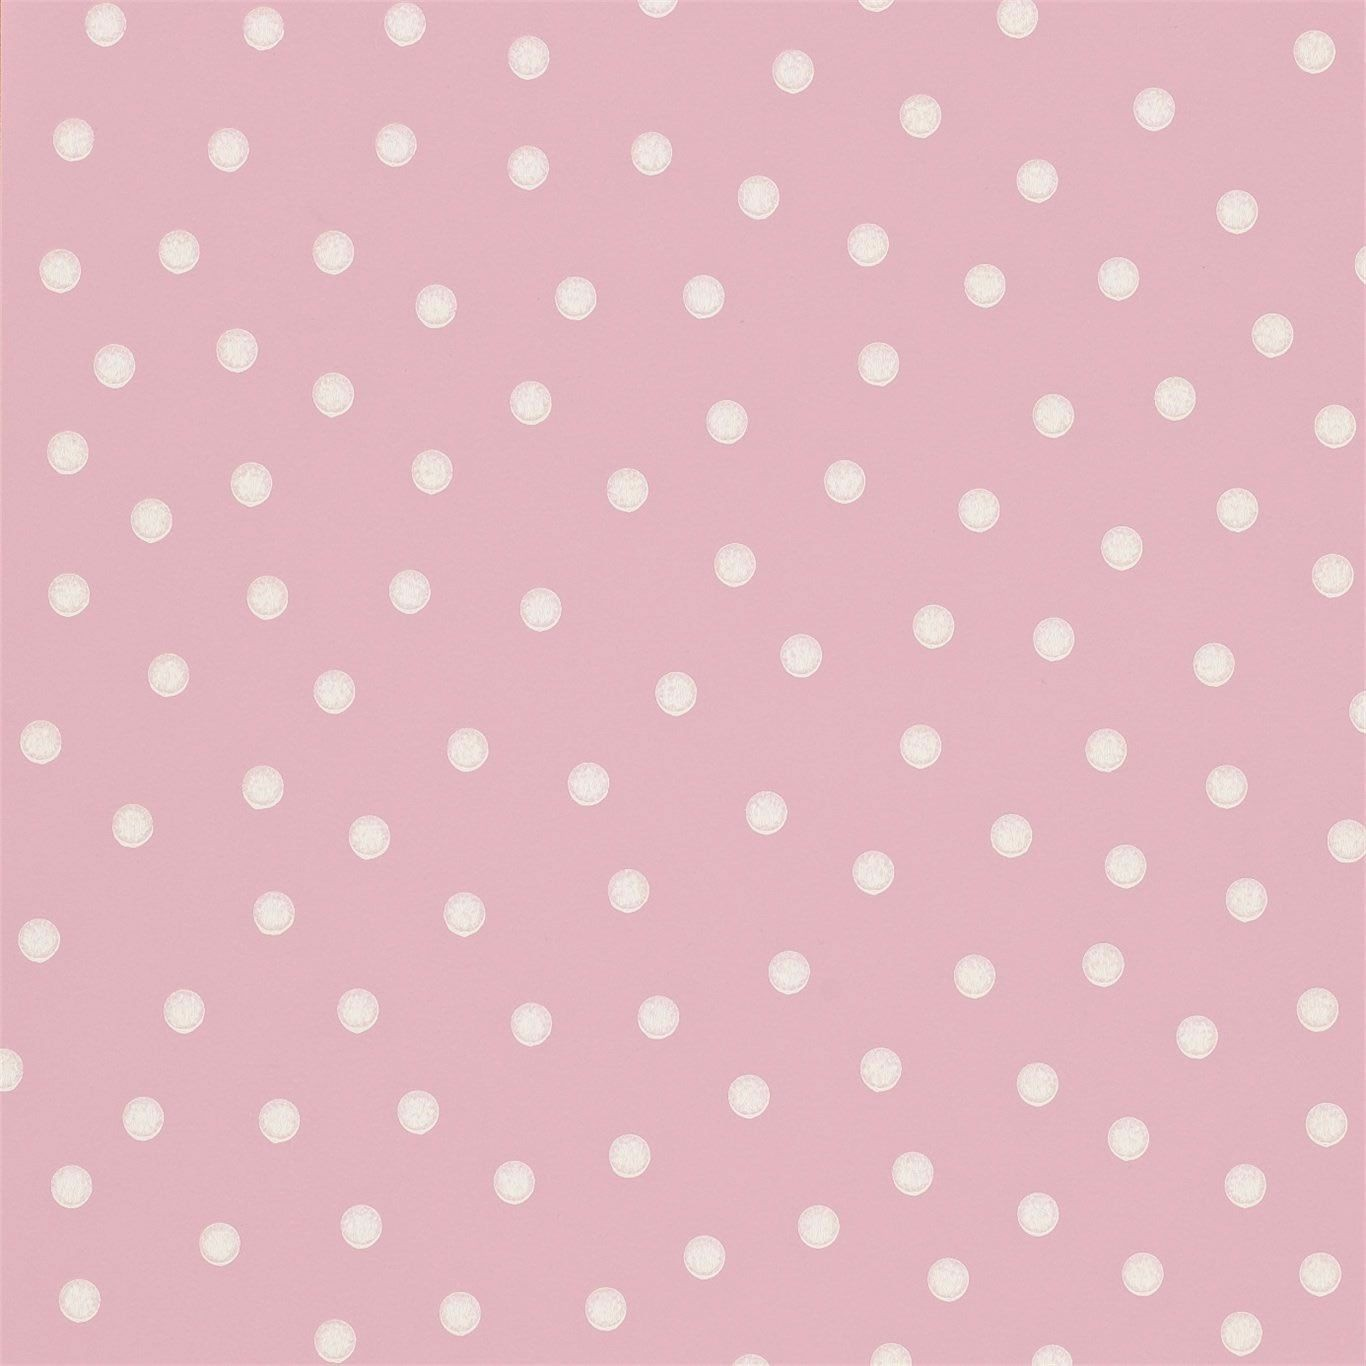 Pink   213616   Polka Dot   Emma Bridgewater   Sanderson Wallpaper 1366x1366